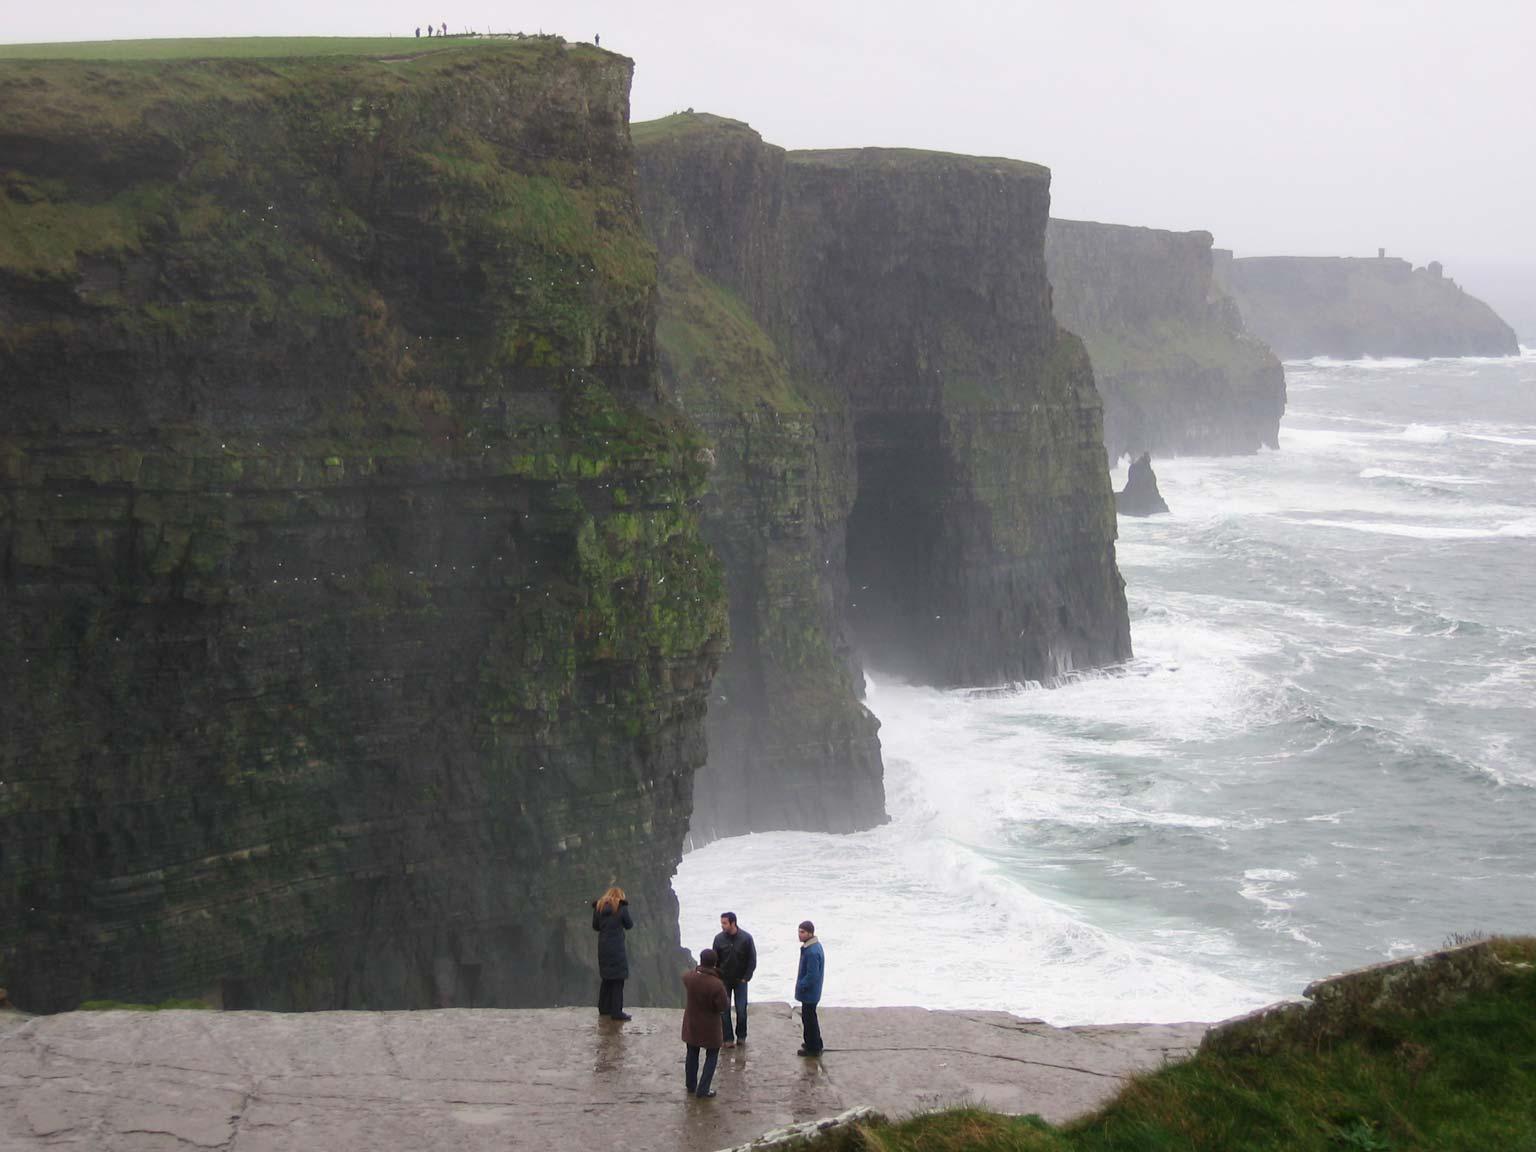 Cliffs of moher aillte an mhothair ireland great panorama picture - Cliffs of moher pictures ...